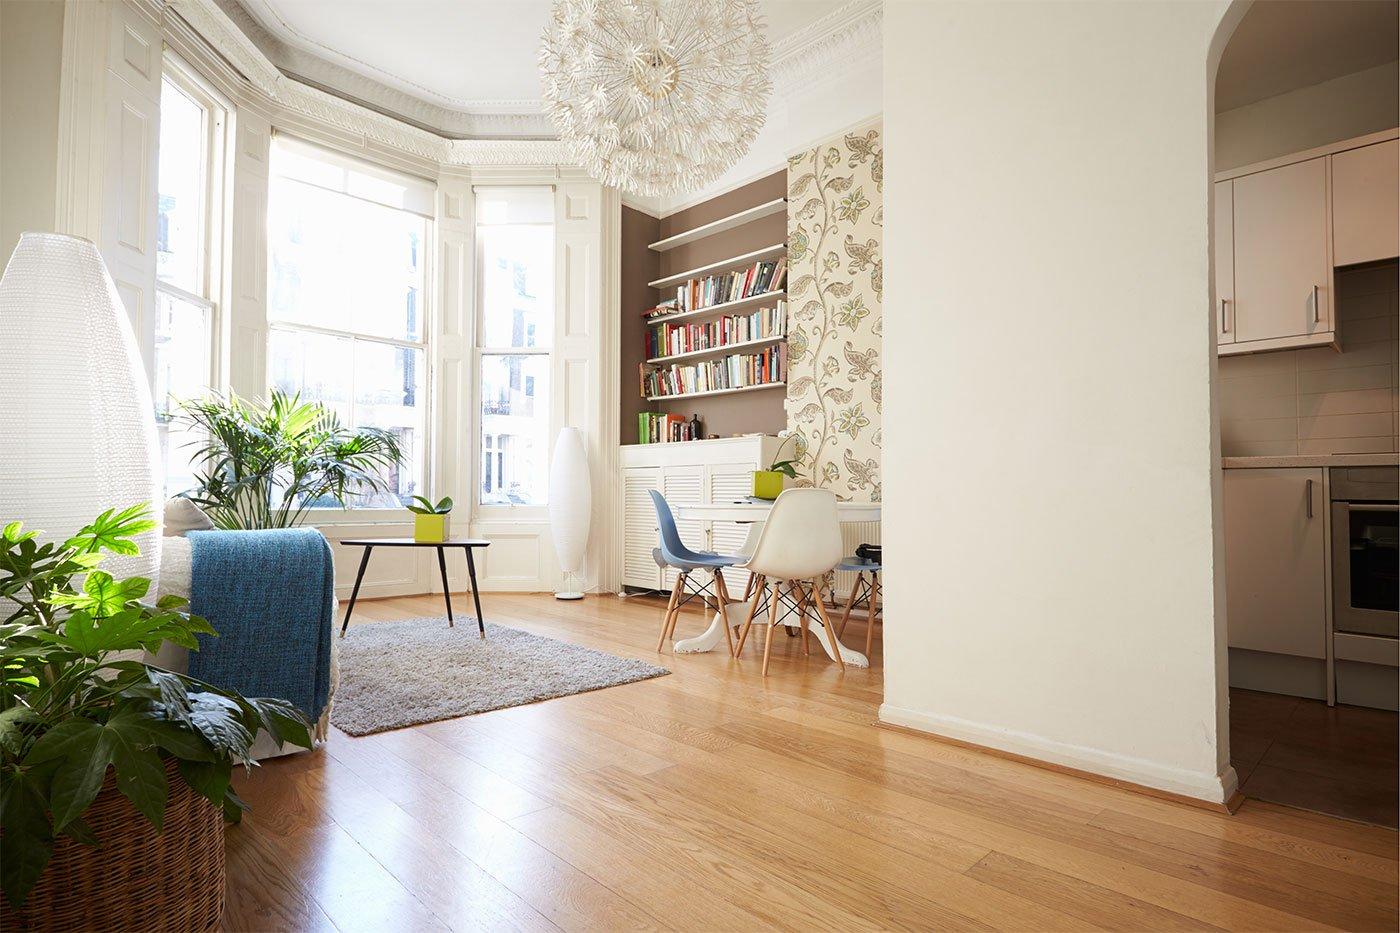 interior design - cool colors, cool home